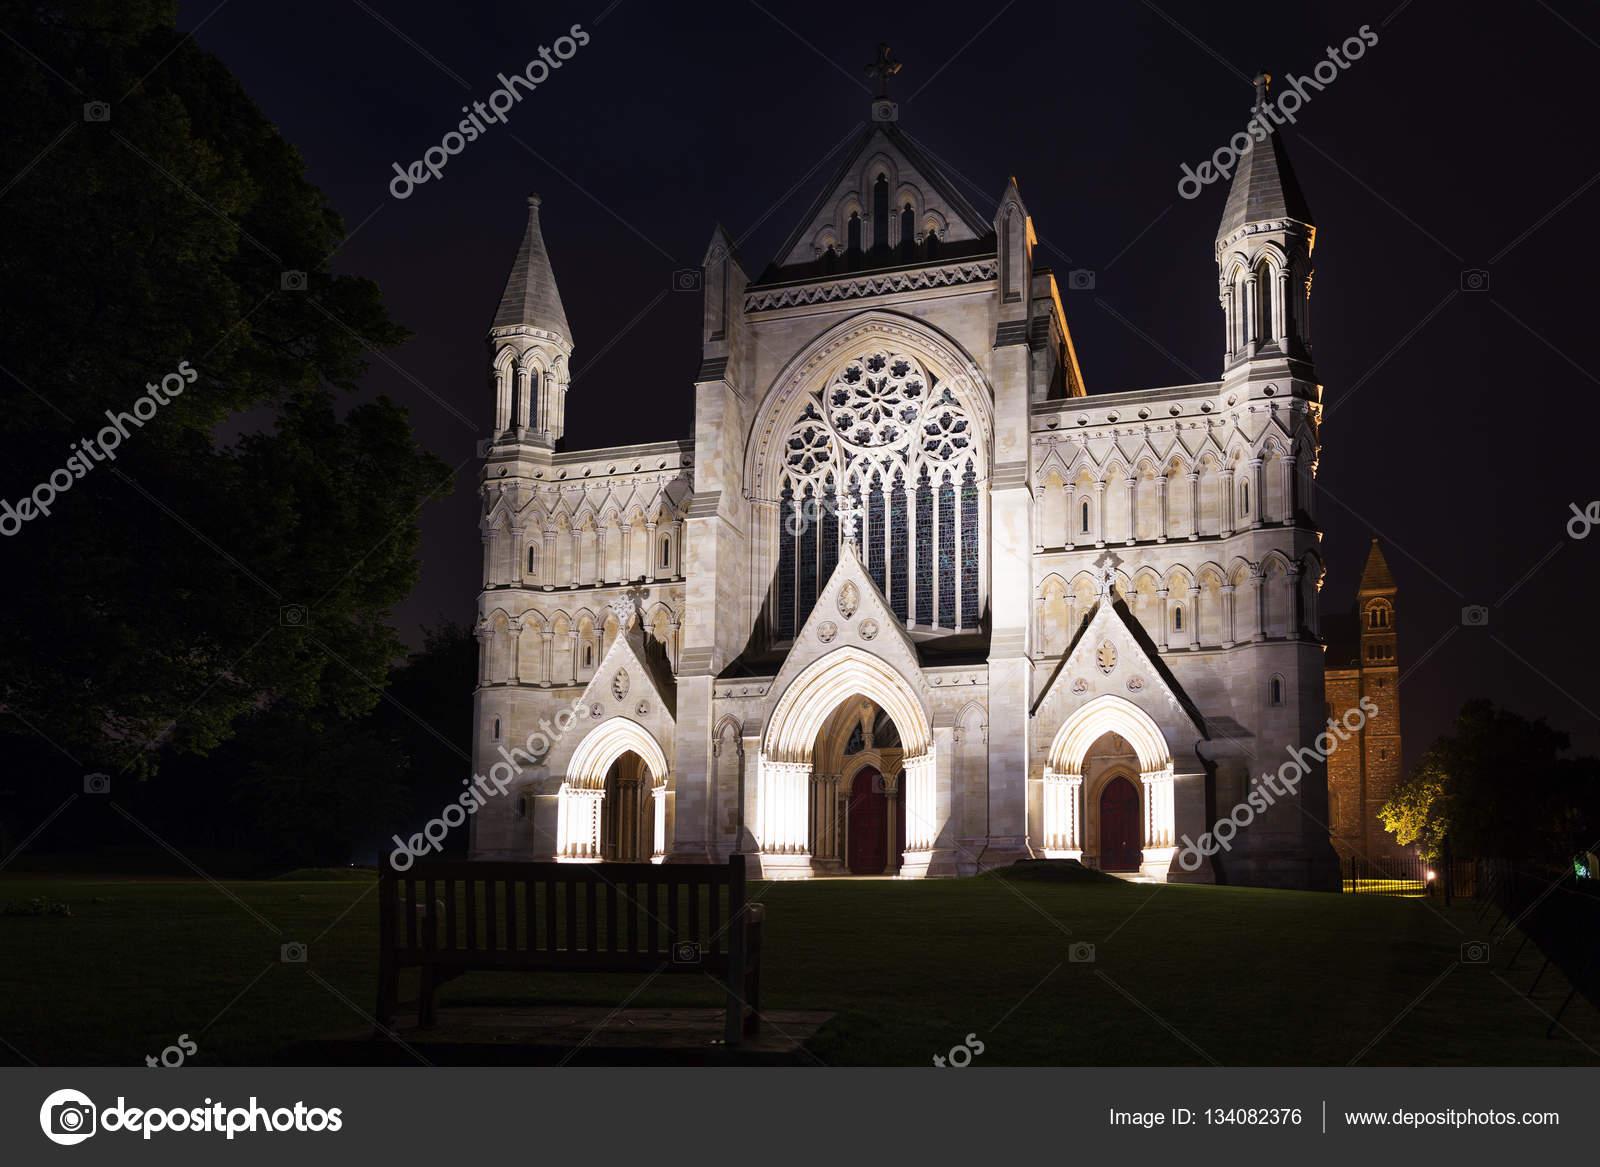 St Albans abdij kerk verlichting Engeland Uk — Stockfoto ...